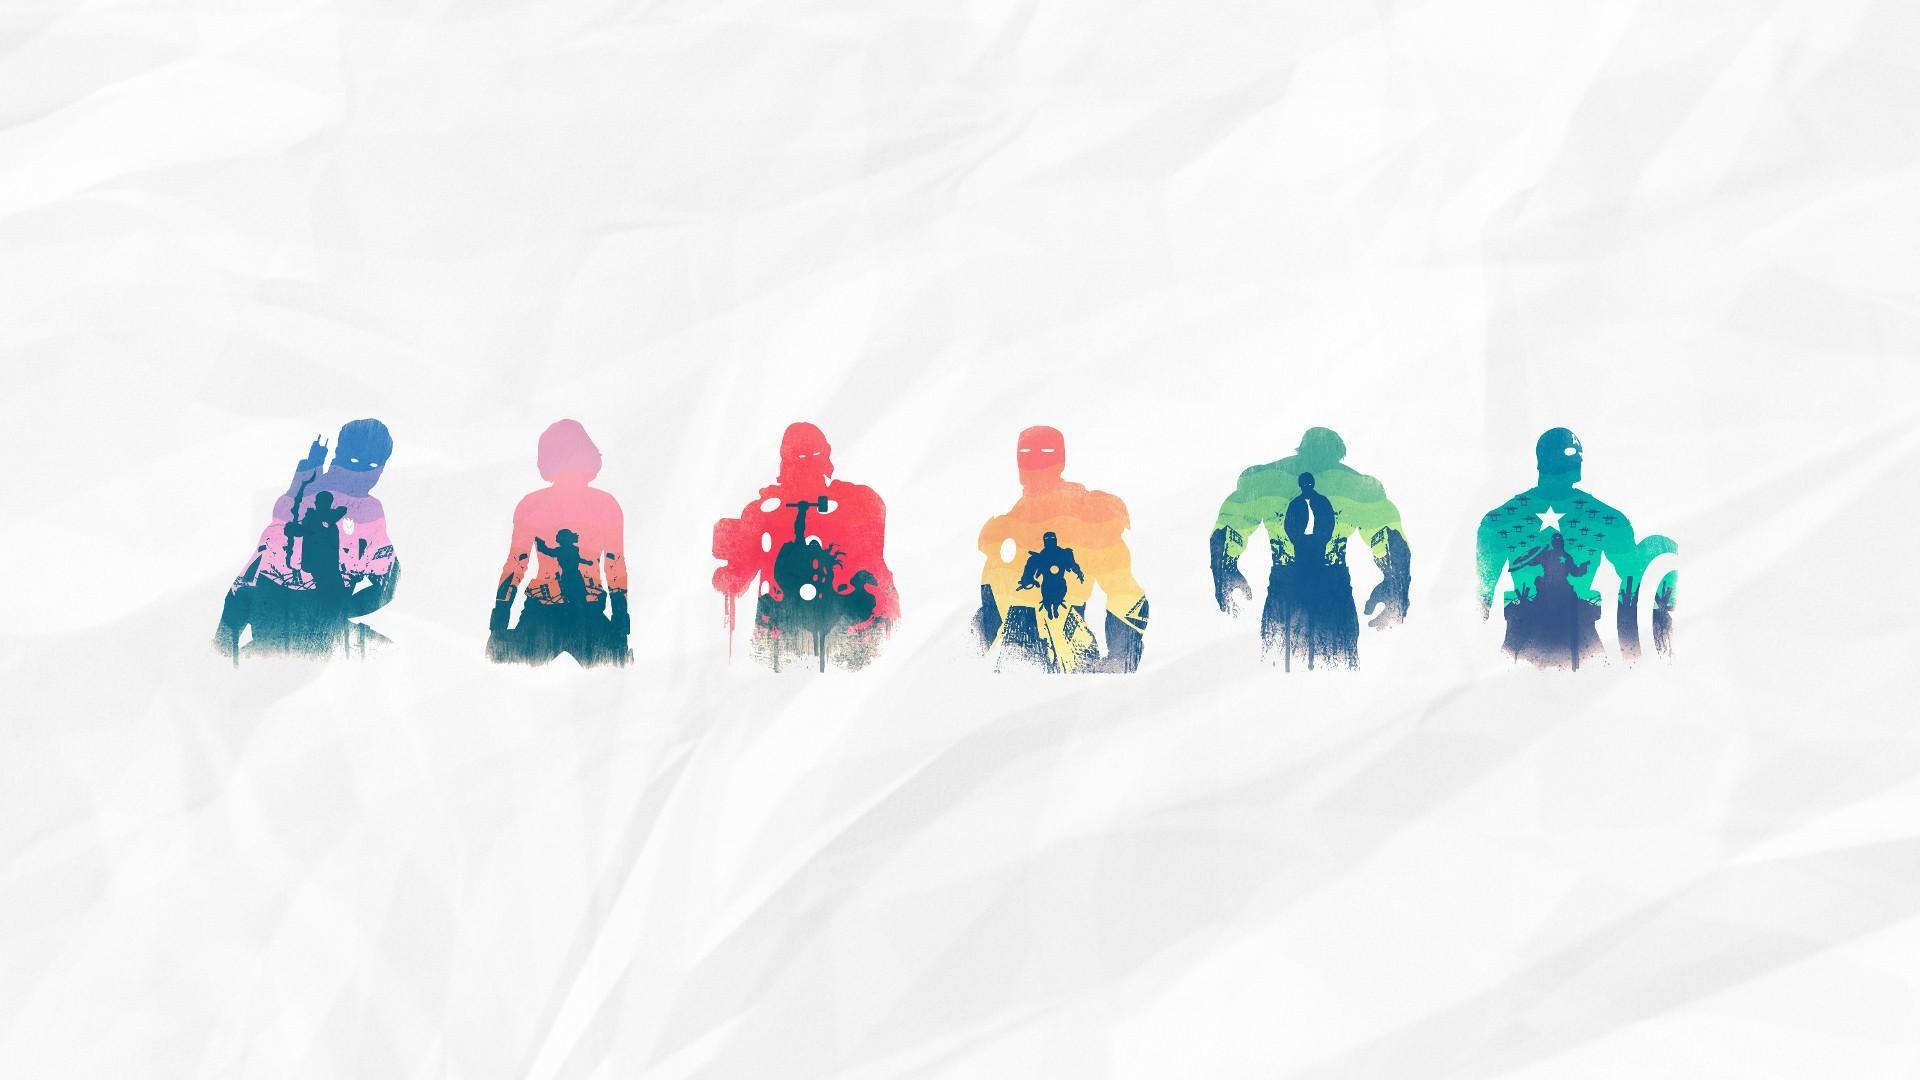 Cute Cartoon Character Wallpaper 61 Images